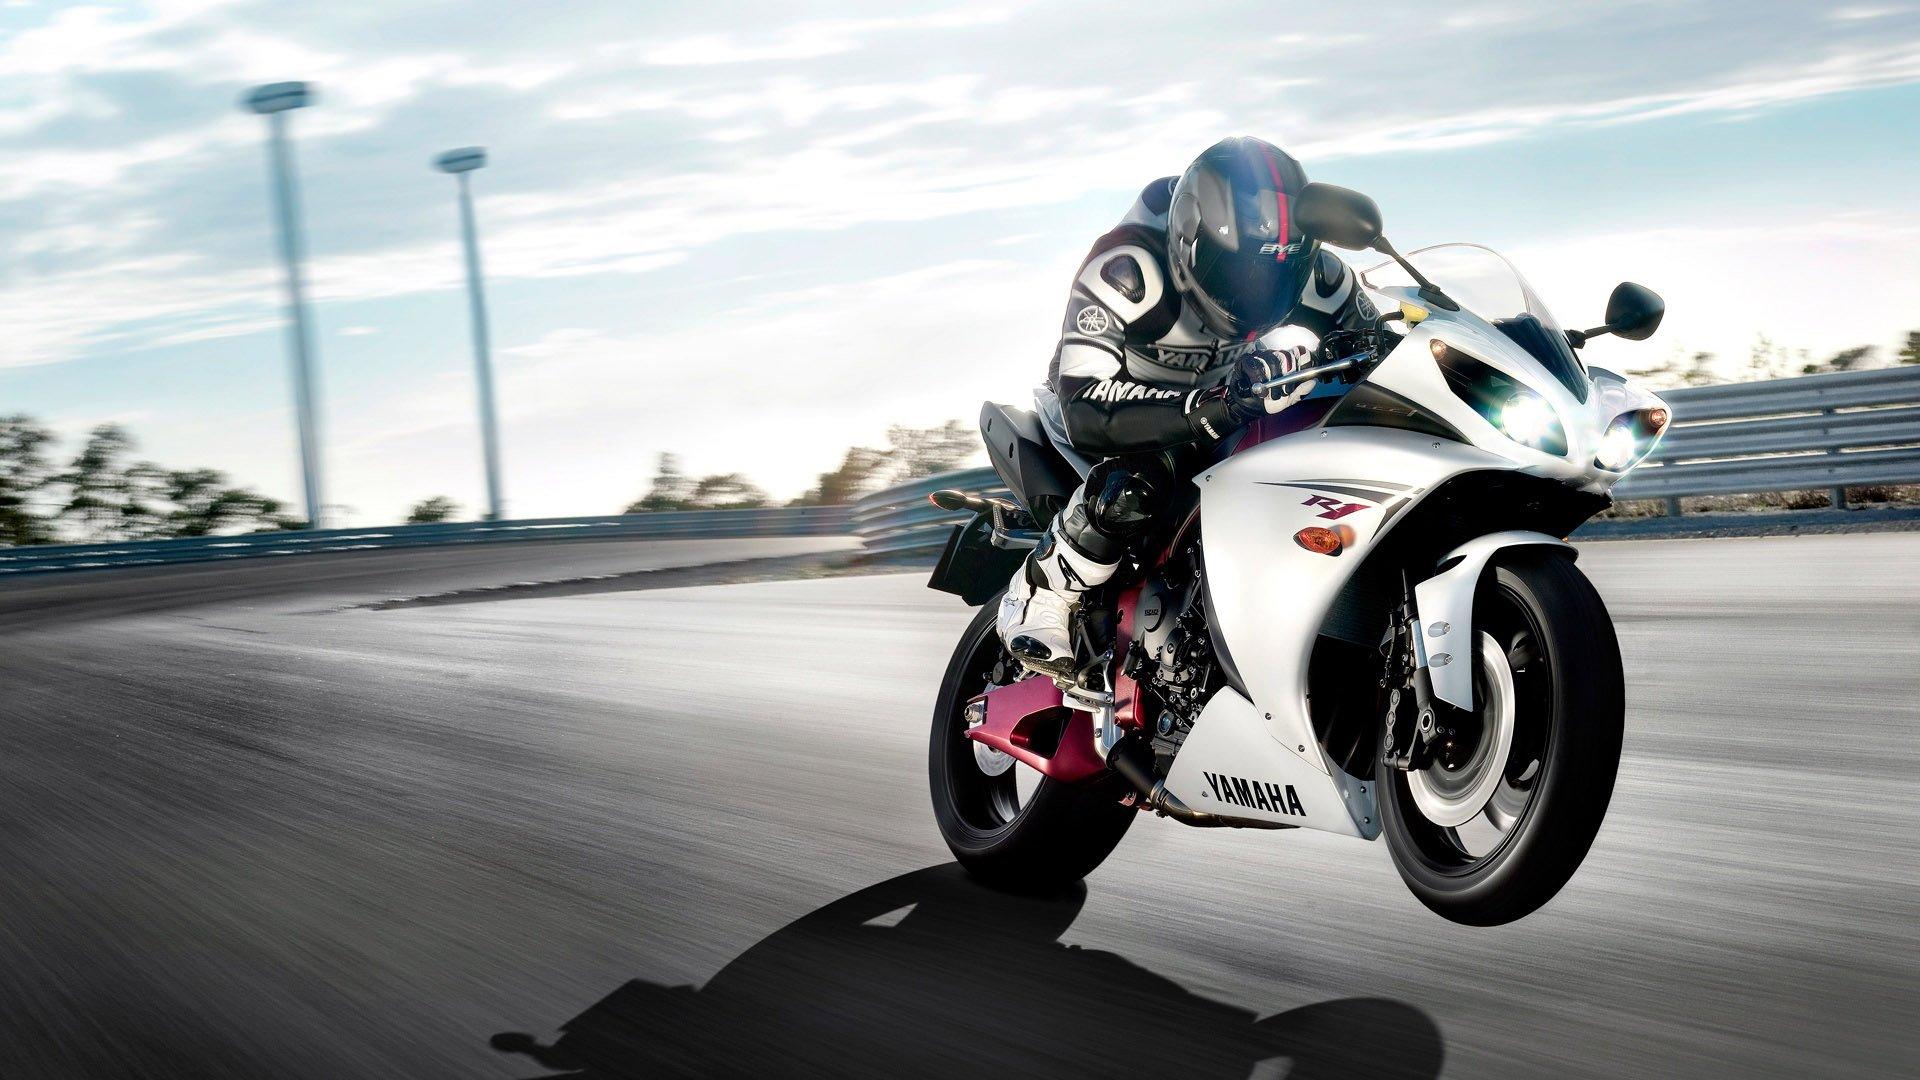 Yamaha Bike Ride Wallpapers  HD HTML Code